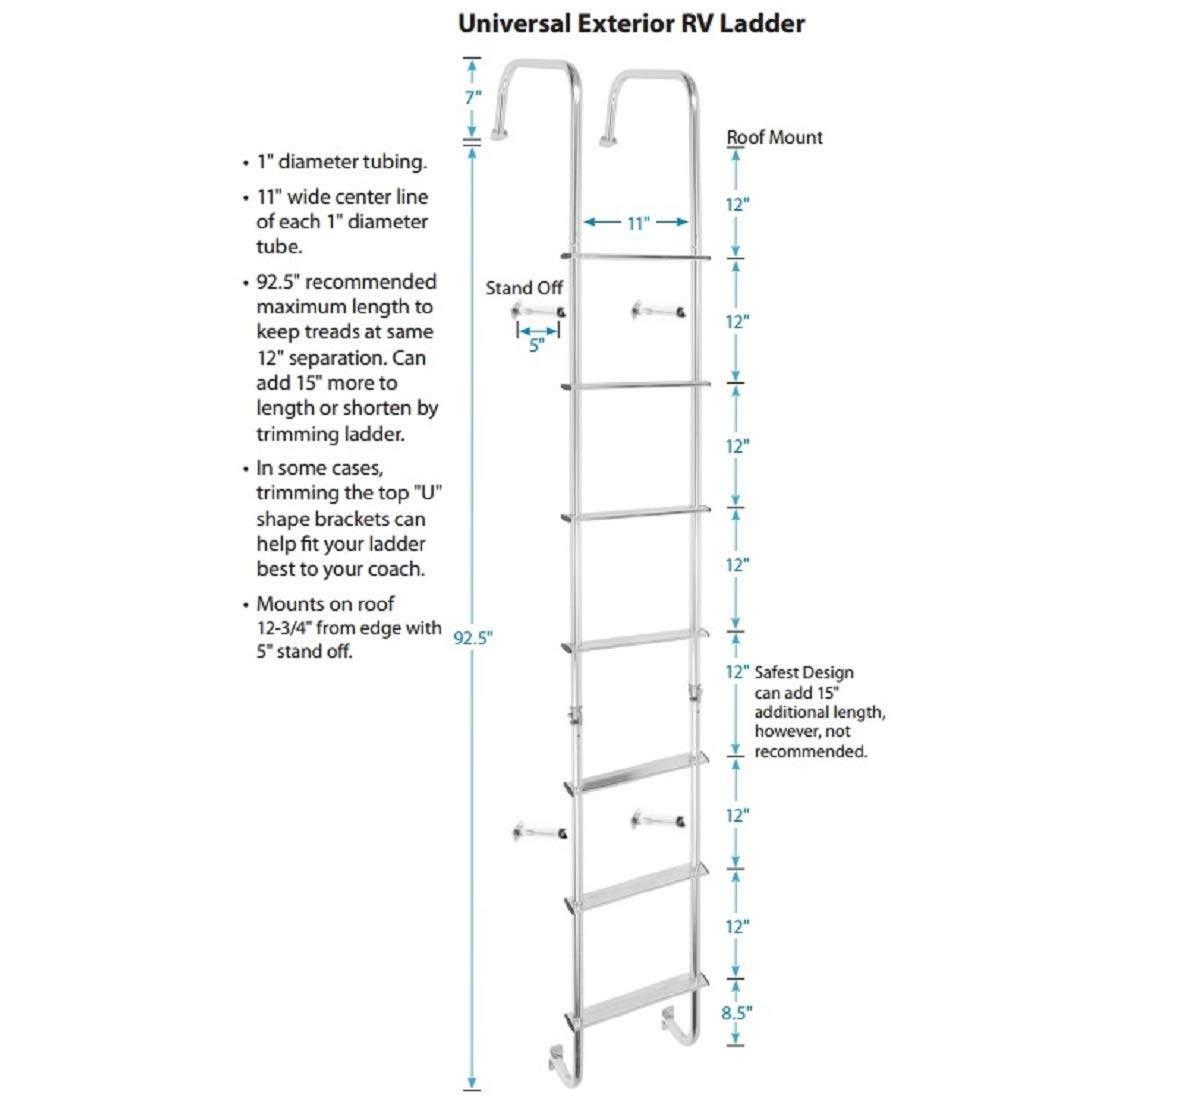 amazon com: stromberg carlson 0139 2100 silver la-401 universal exterior rv  ladder: automotive